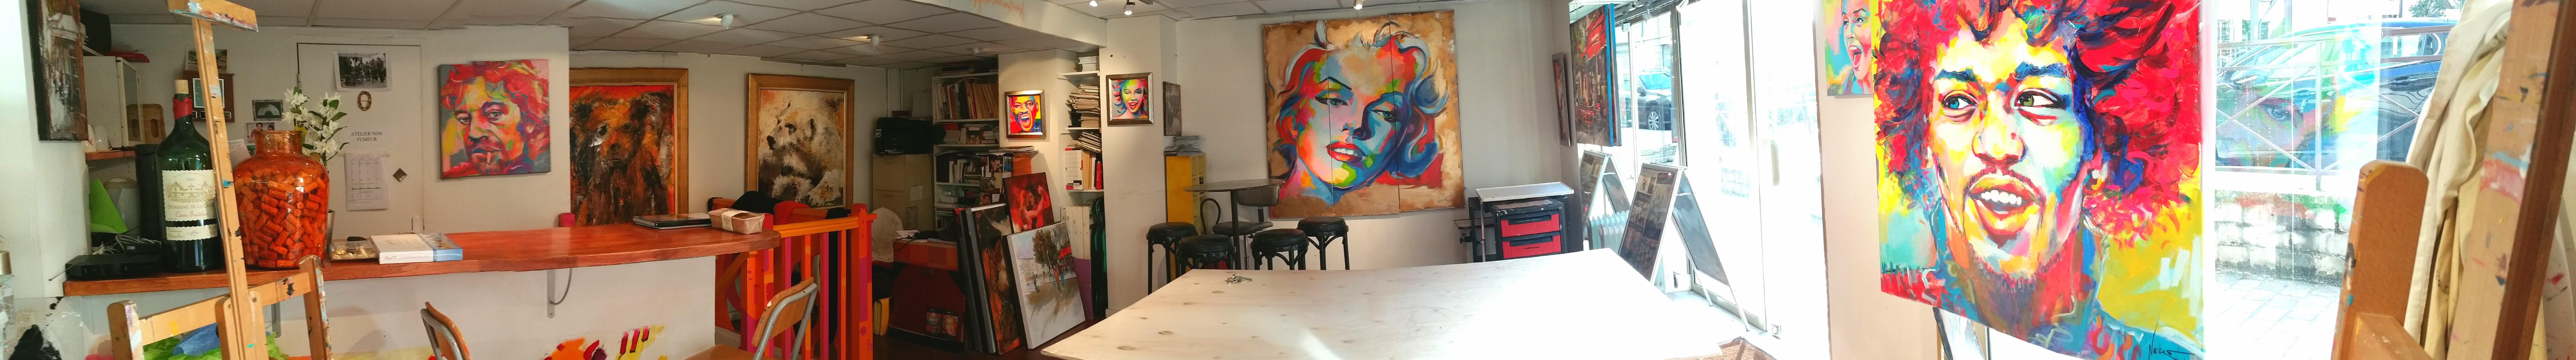 Galerie Antony premier Niveau